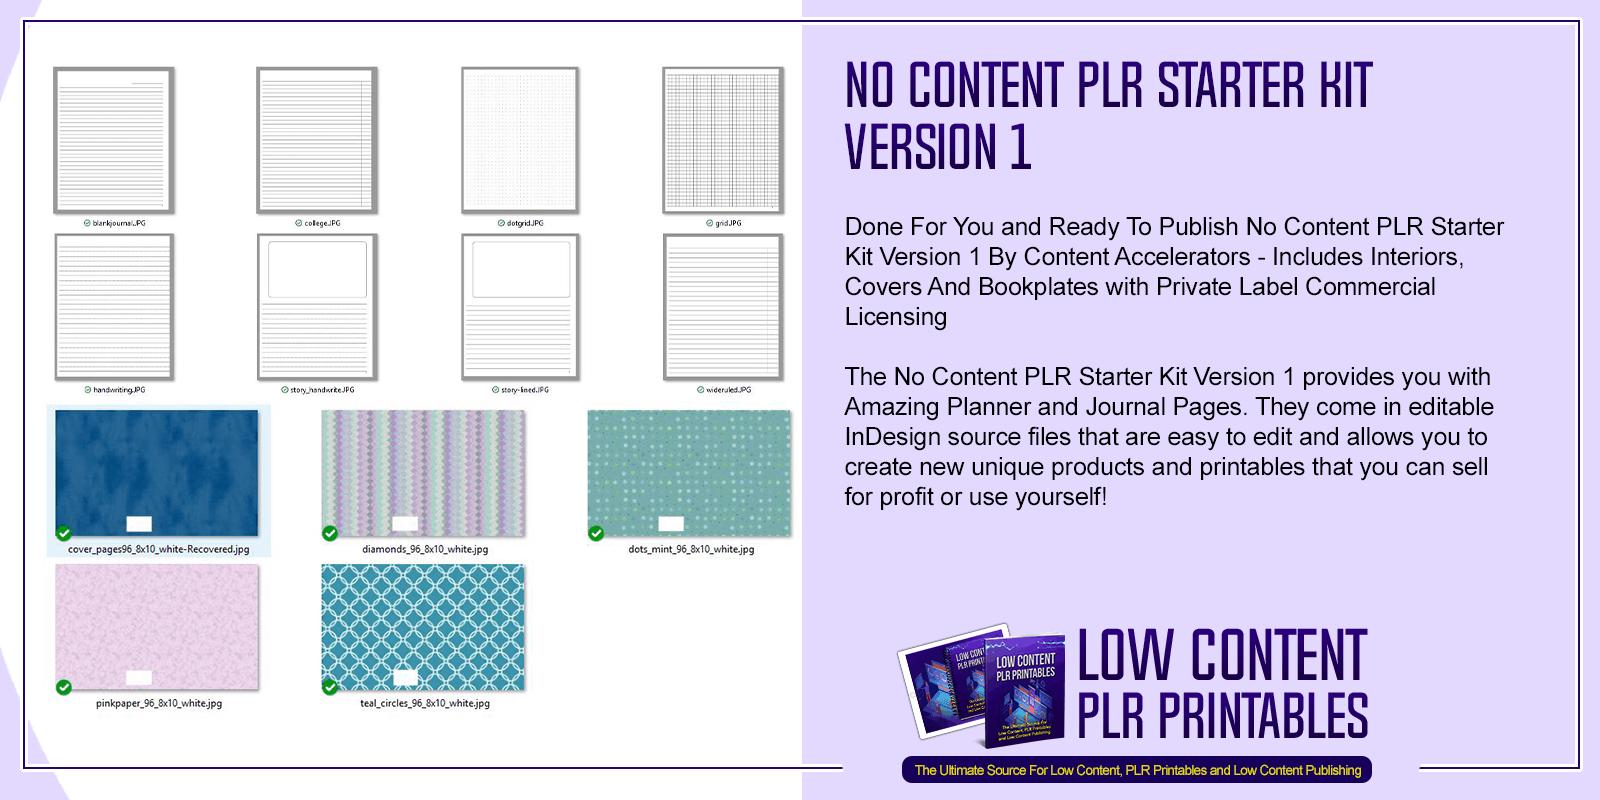 No Content PLR Starter Kit Version 1